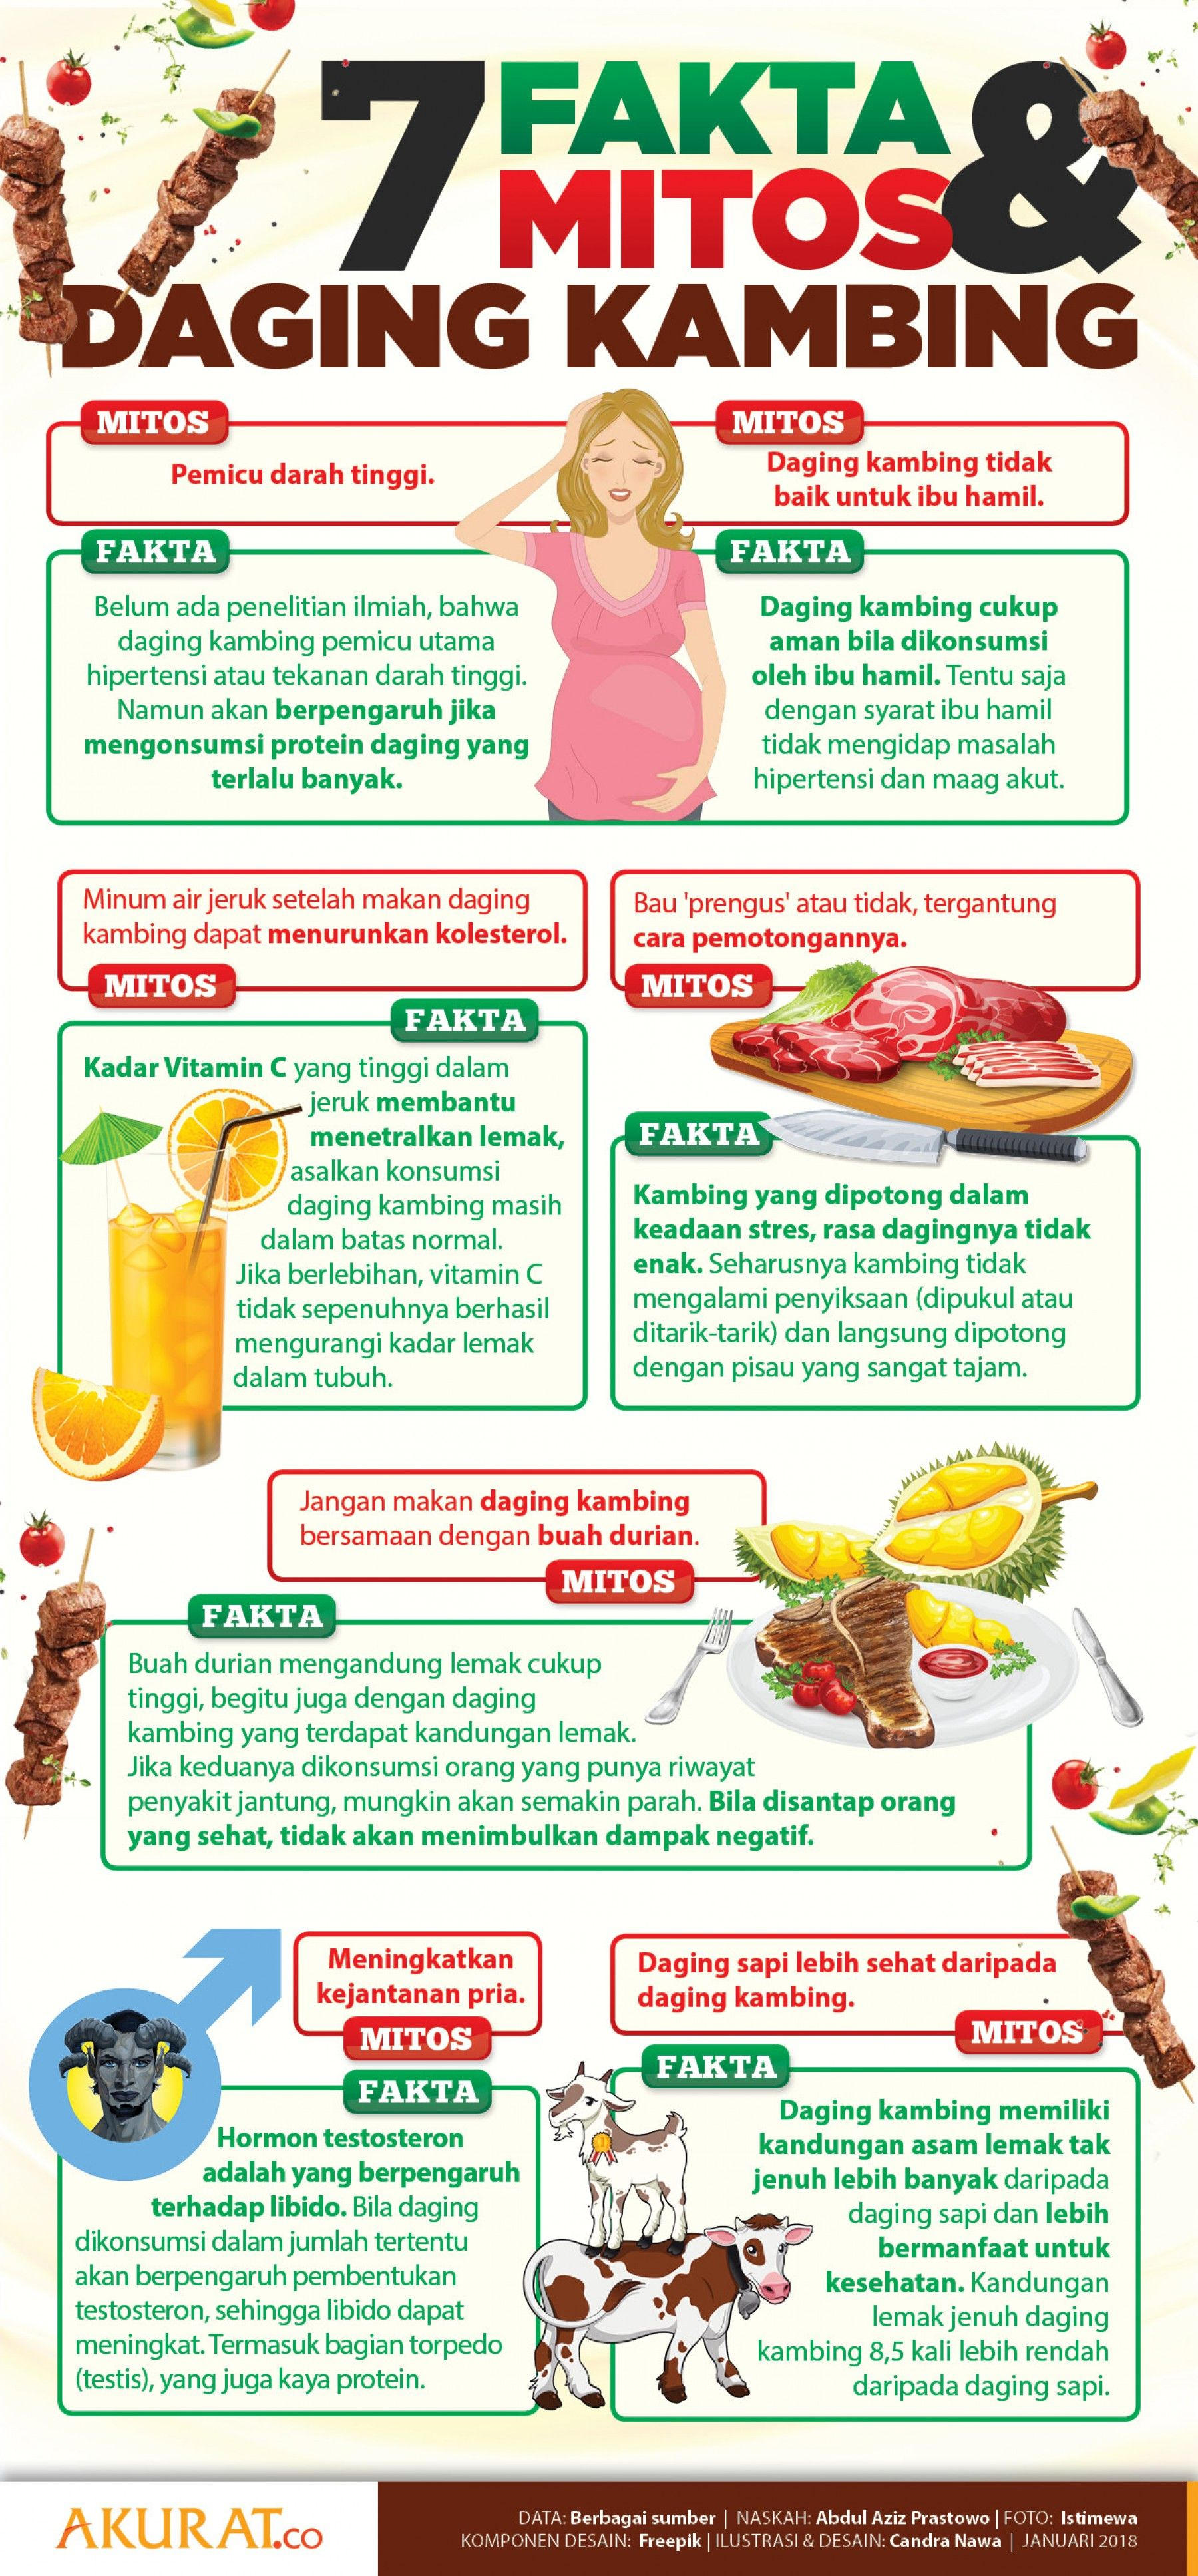 7 Fakta Mitos Konsumsi Daging Kambi Bagi Ibu Hamil Kambing Masakan Daging Kambing